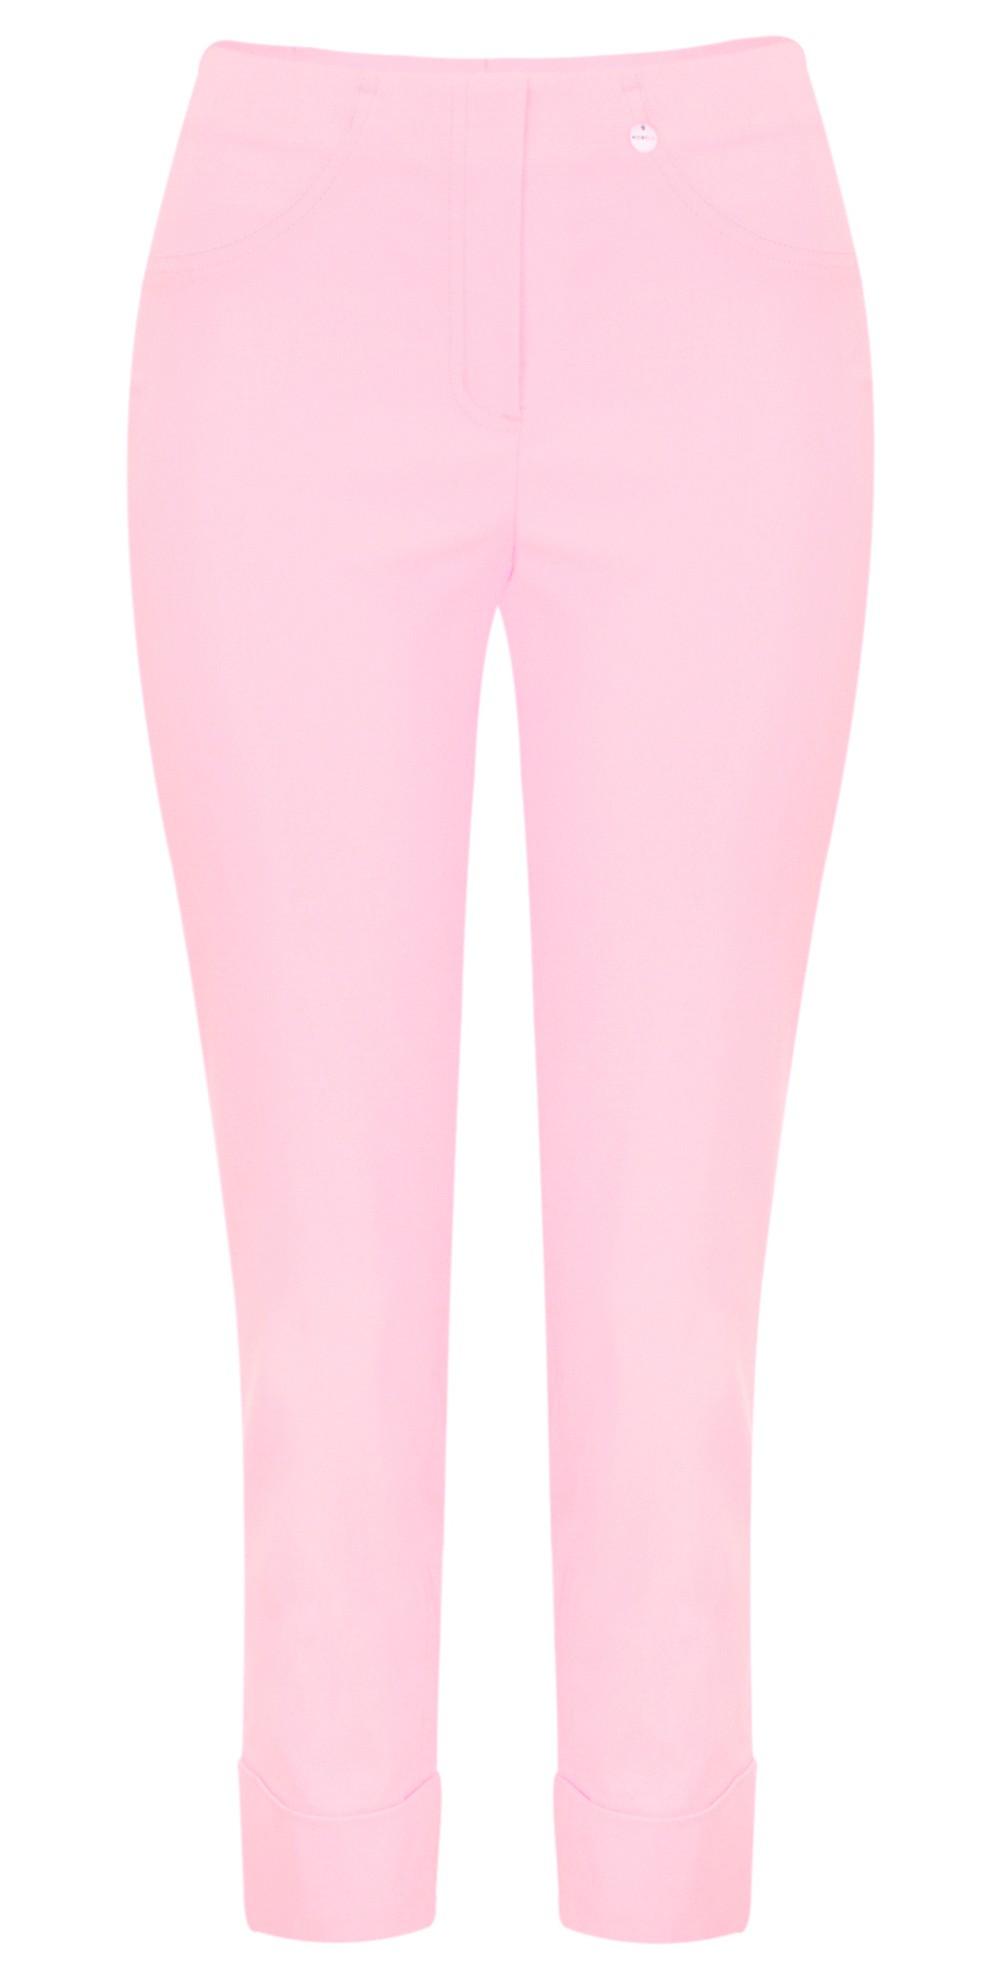 Bella 09 Sorbet Rose Ankle Length Crop Cuff Trouser main image